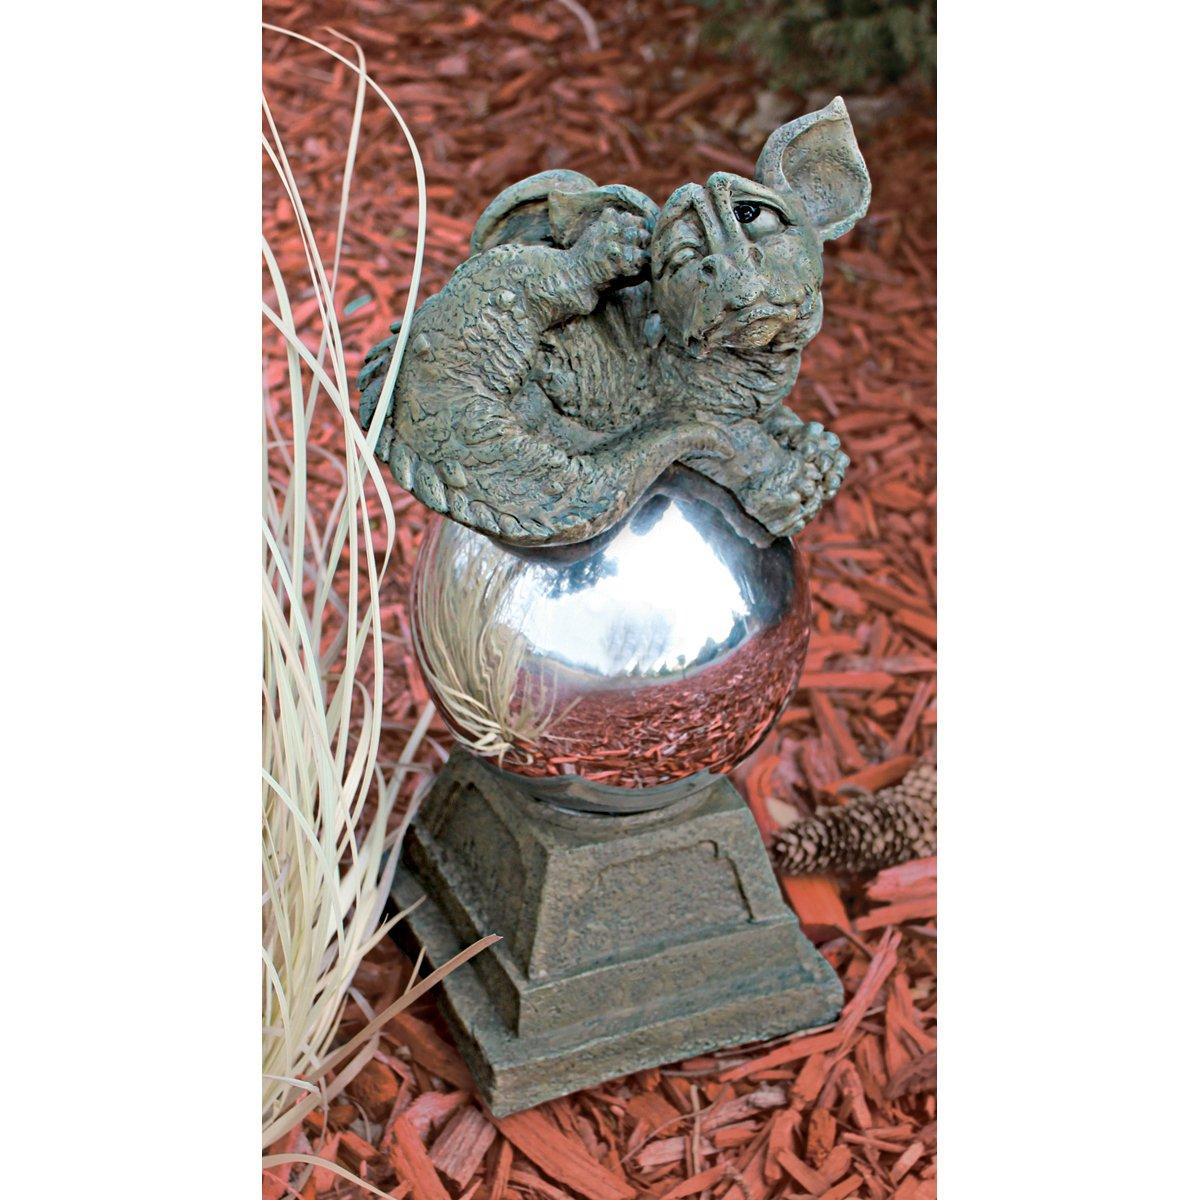 Design Toscano SH22237 Blushing Babel the Bashful Dragon Statue Large